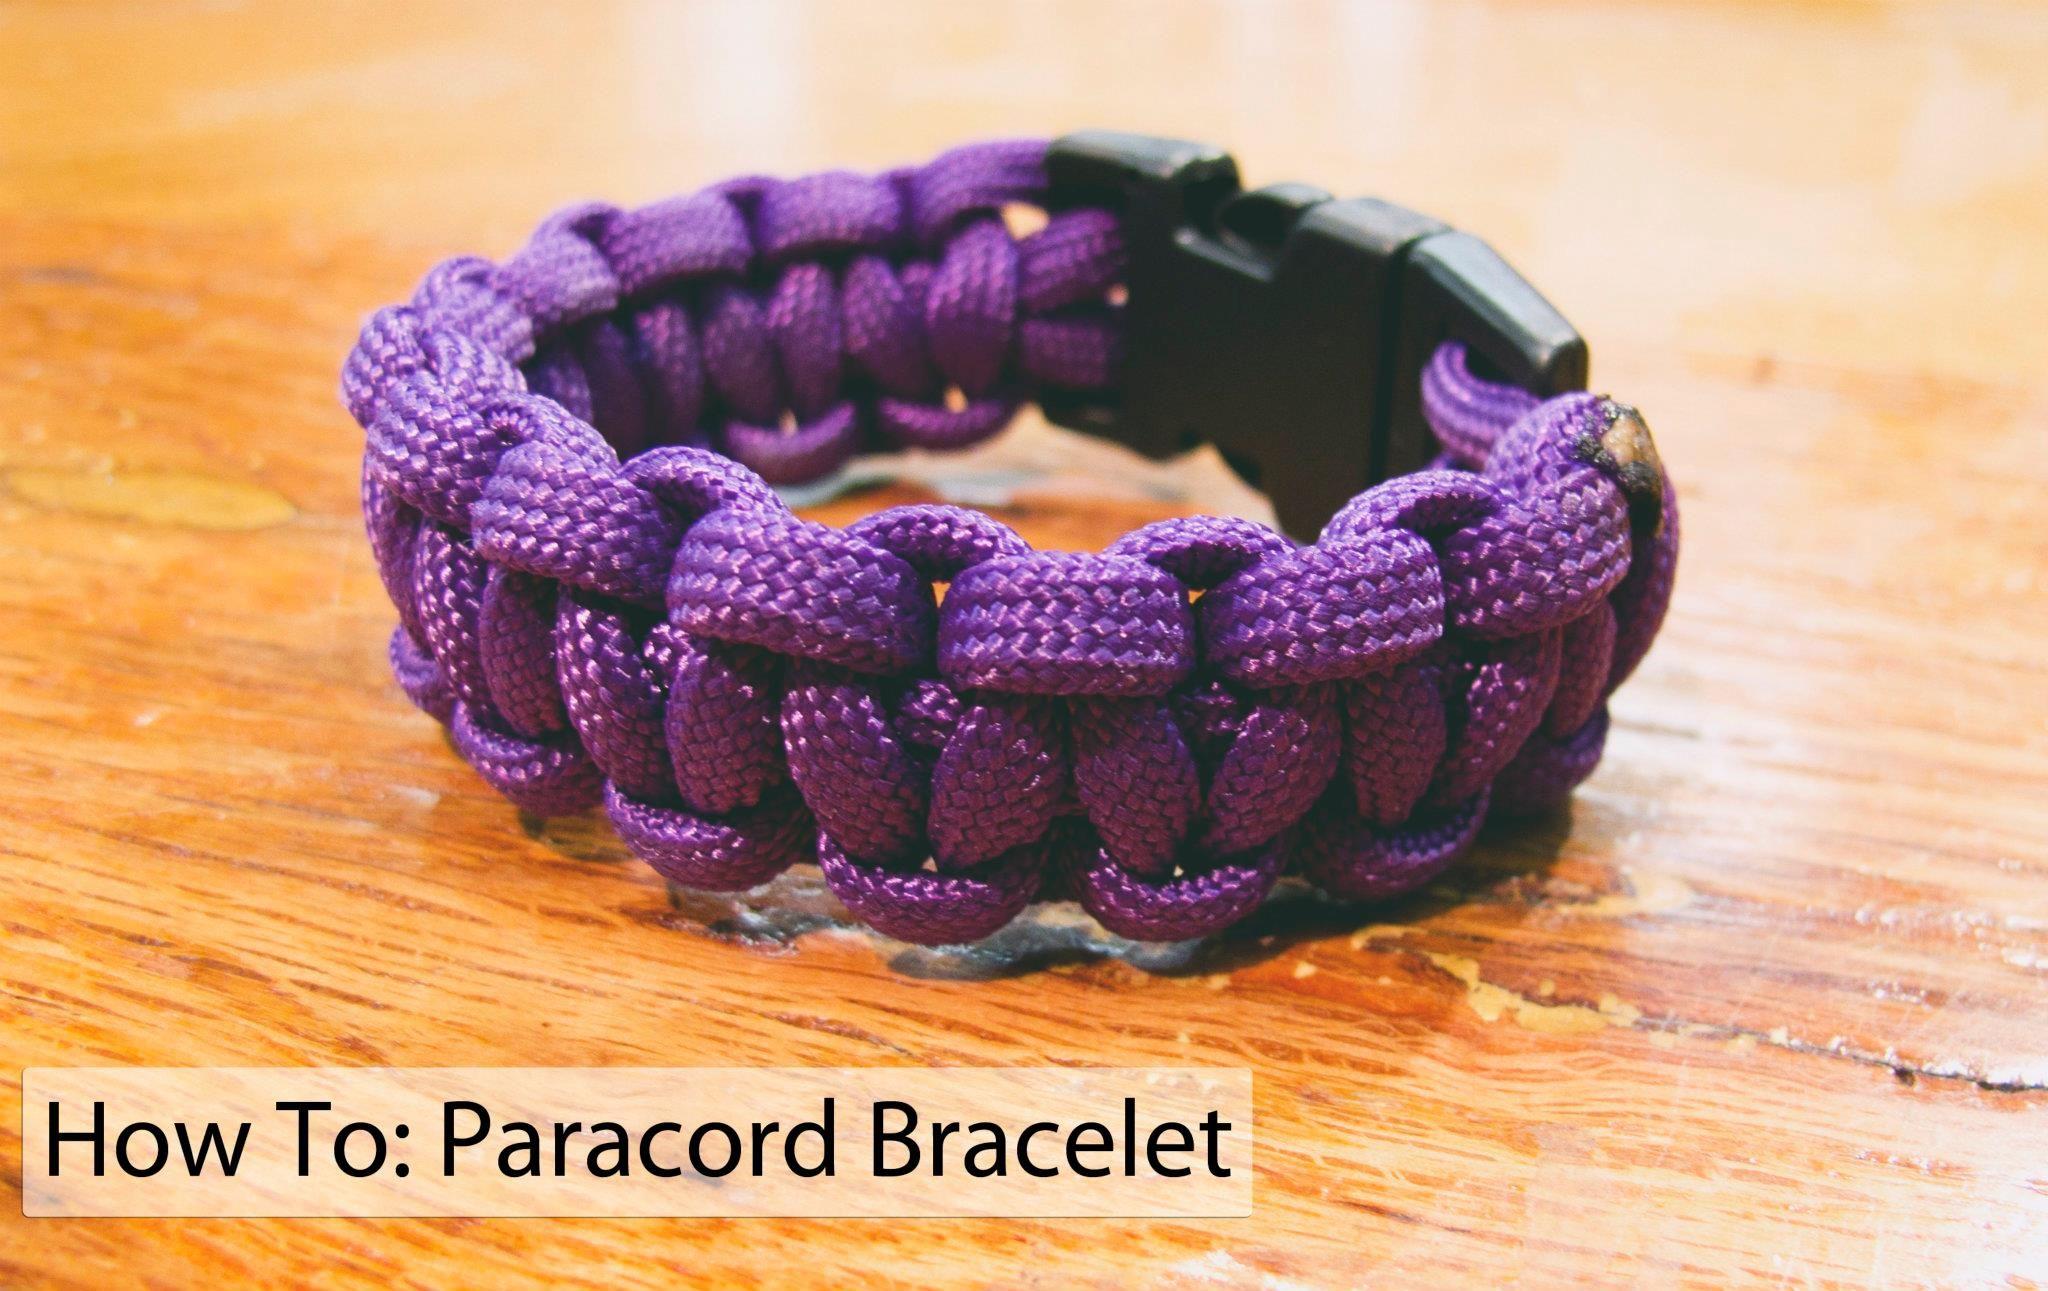 Easytodo paracord bracelet instructions paracord bracelets